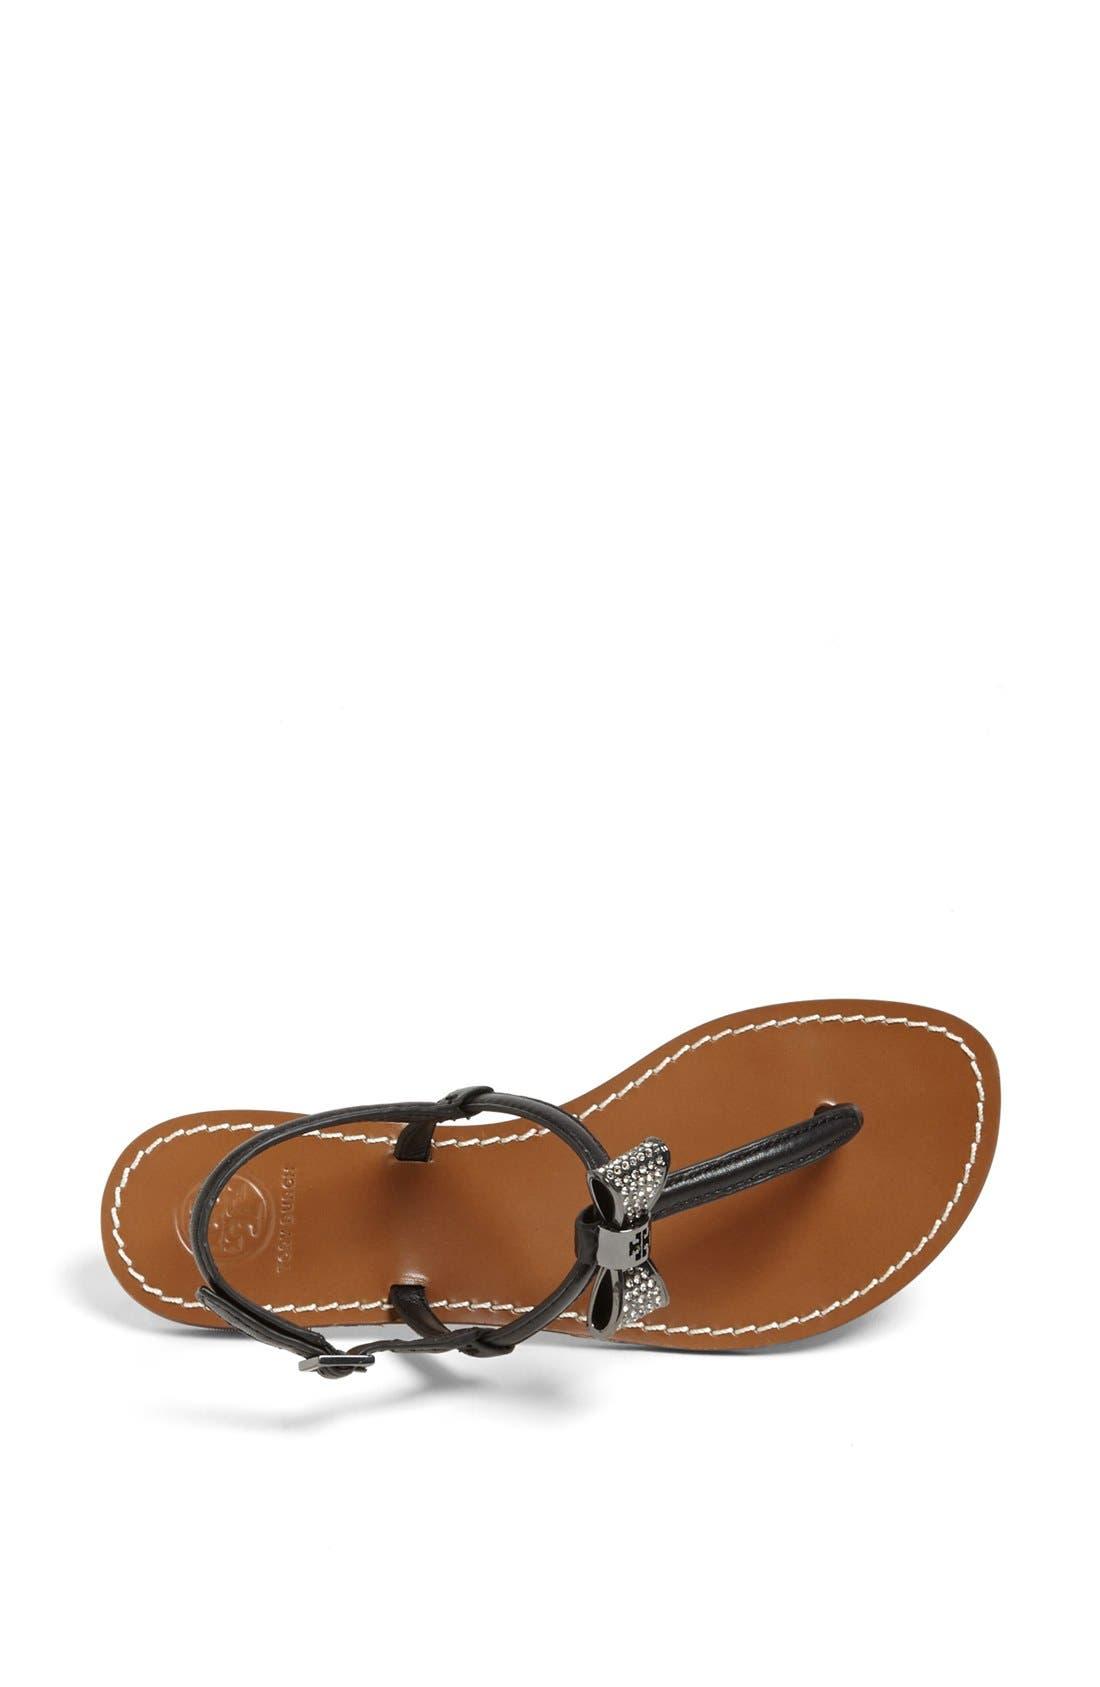 Alternate Image 3  - Tory Burch 'Bryn' Sandal